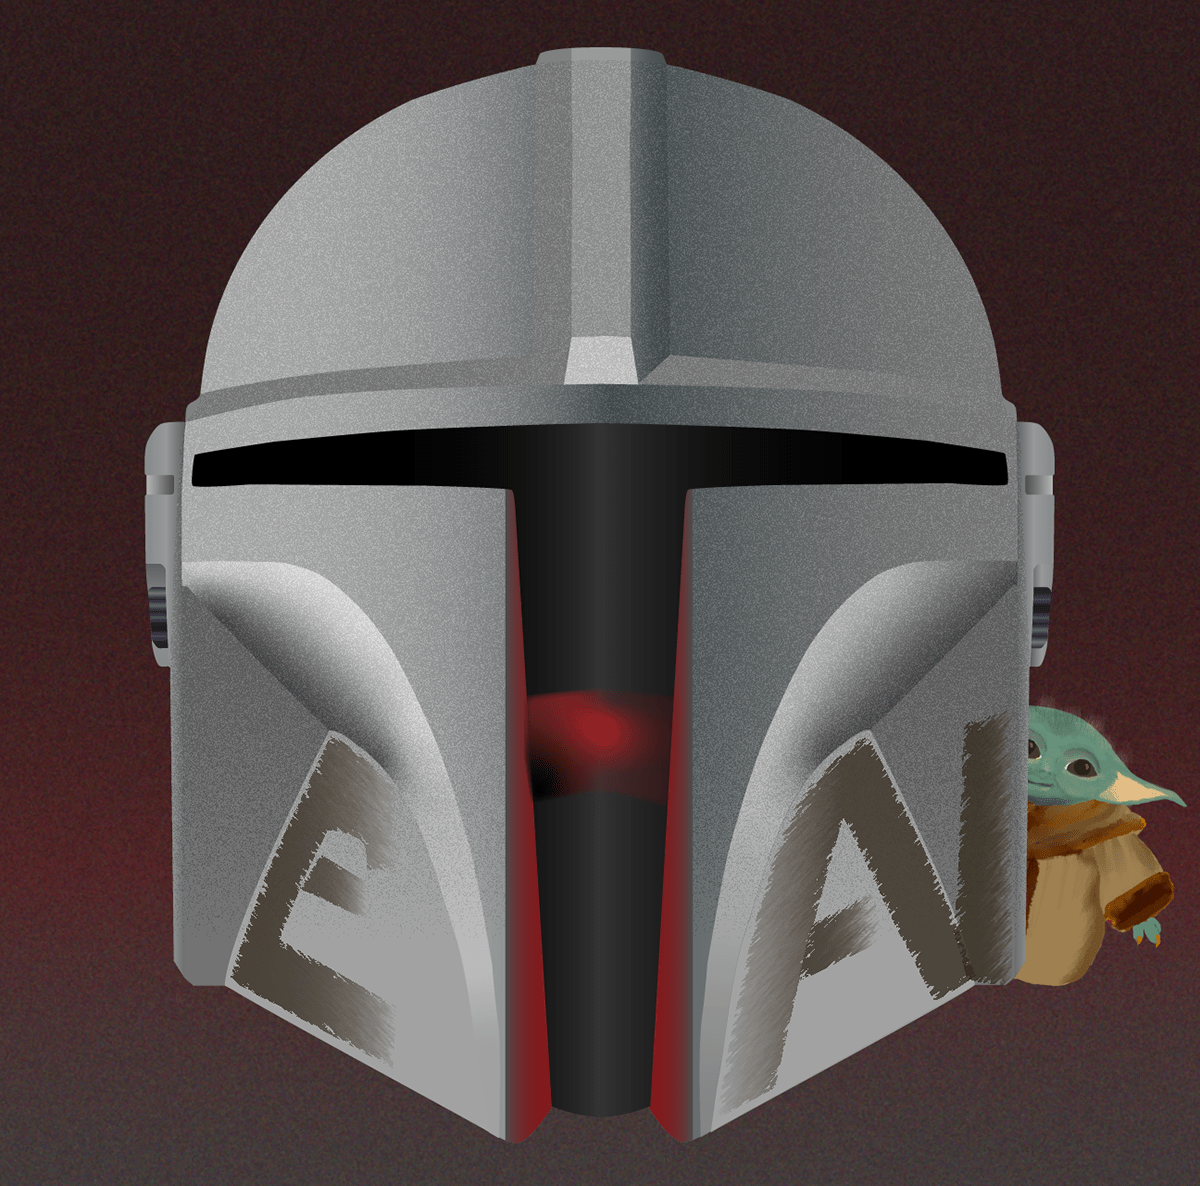 Helmet mandalorian mando star wars